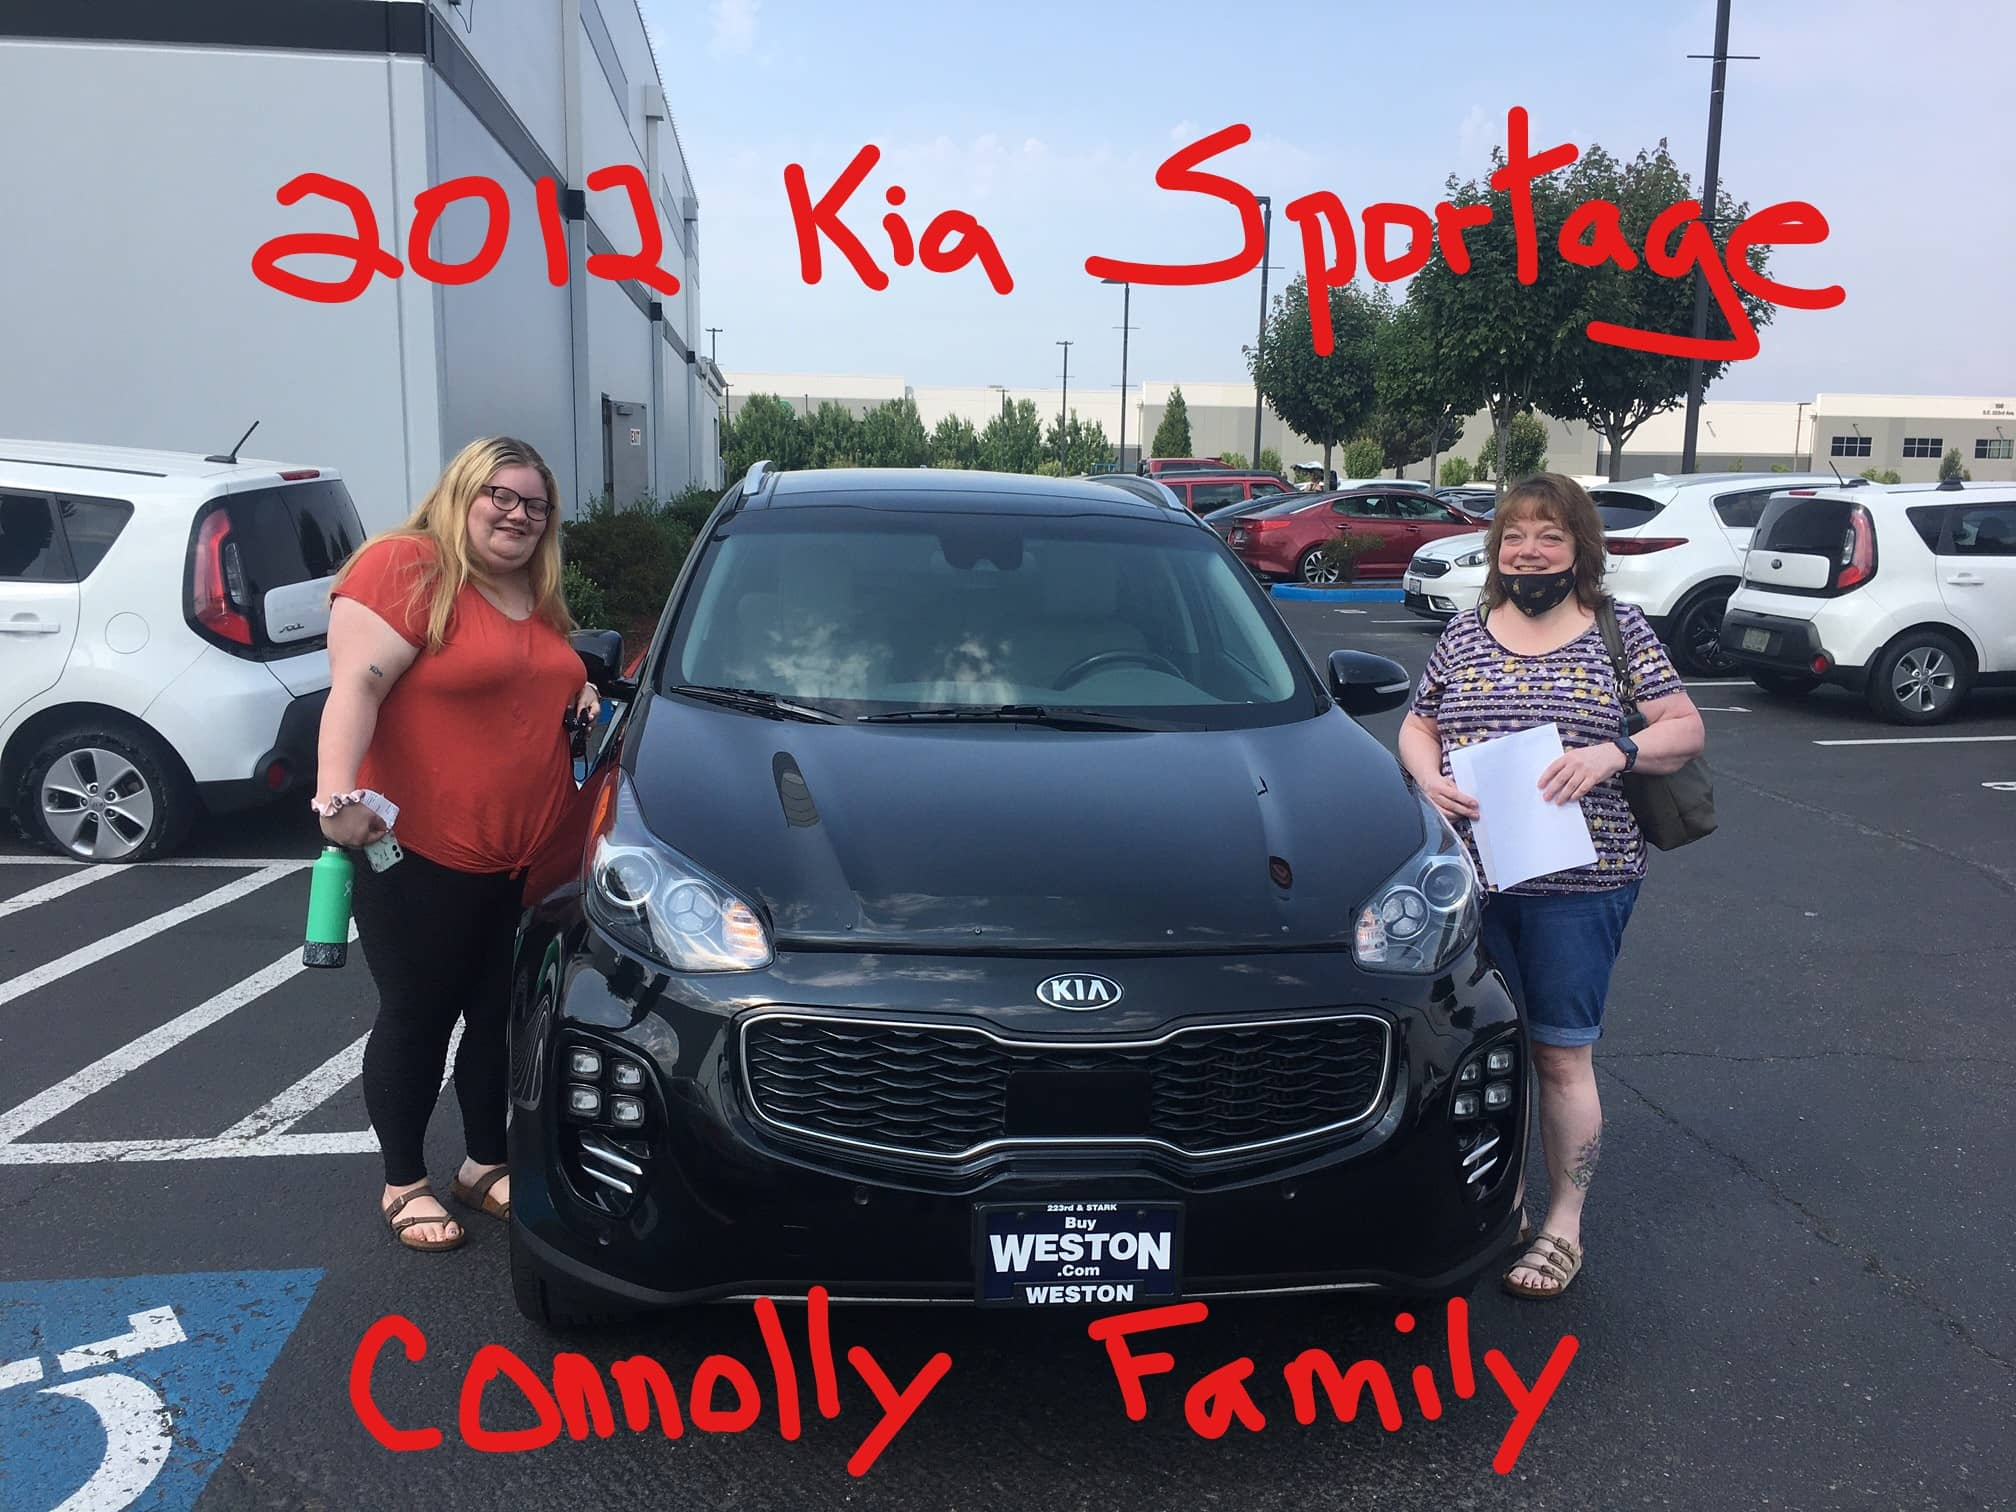 2012 Kia Sportage Connolly Family